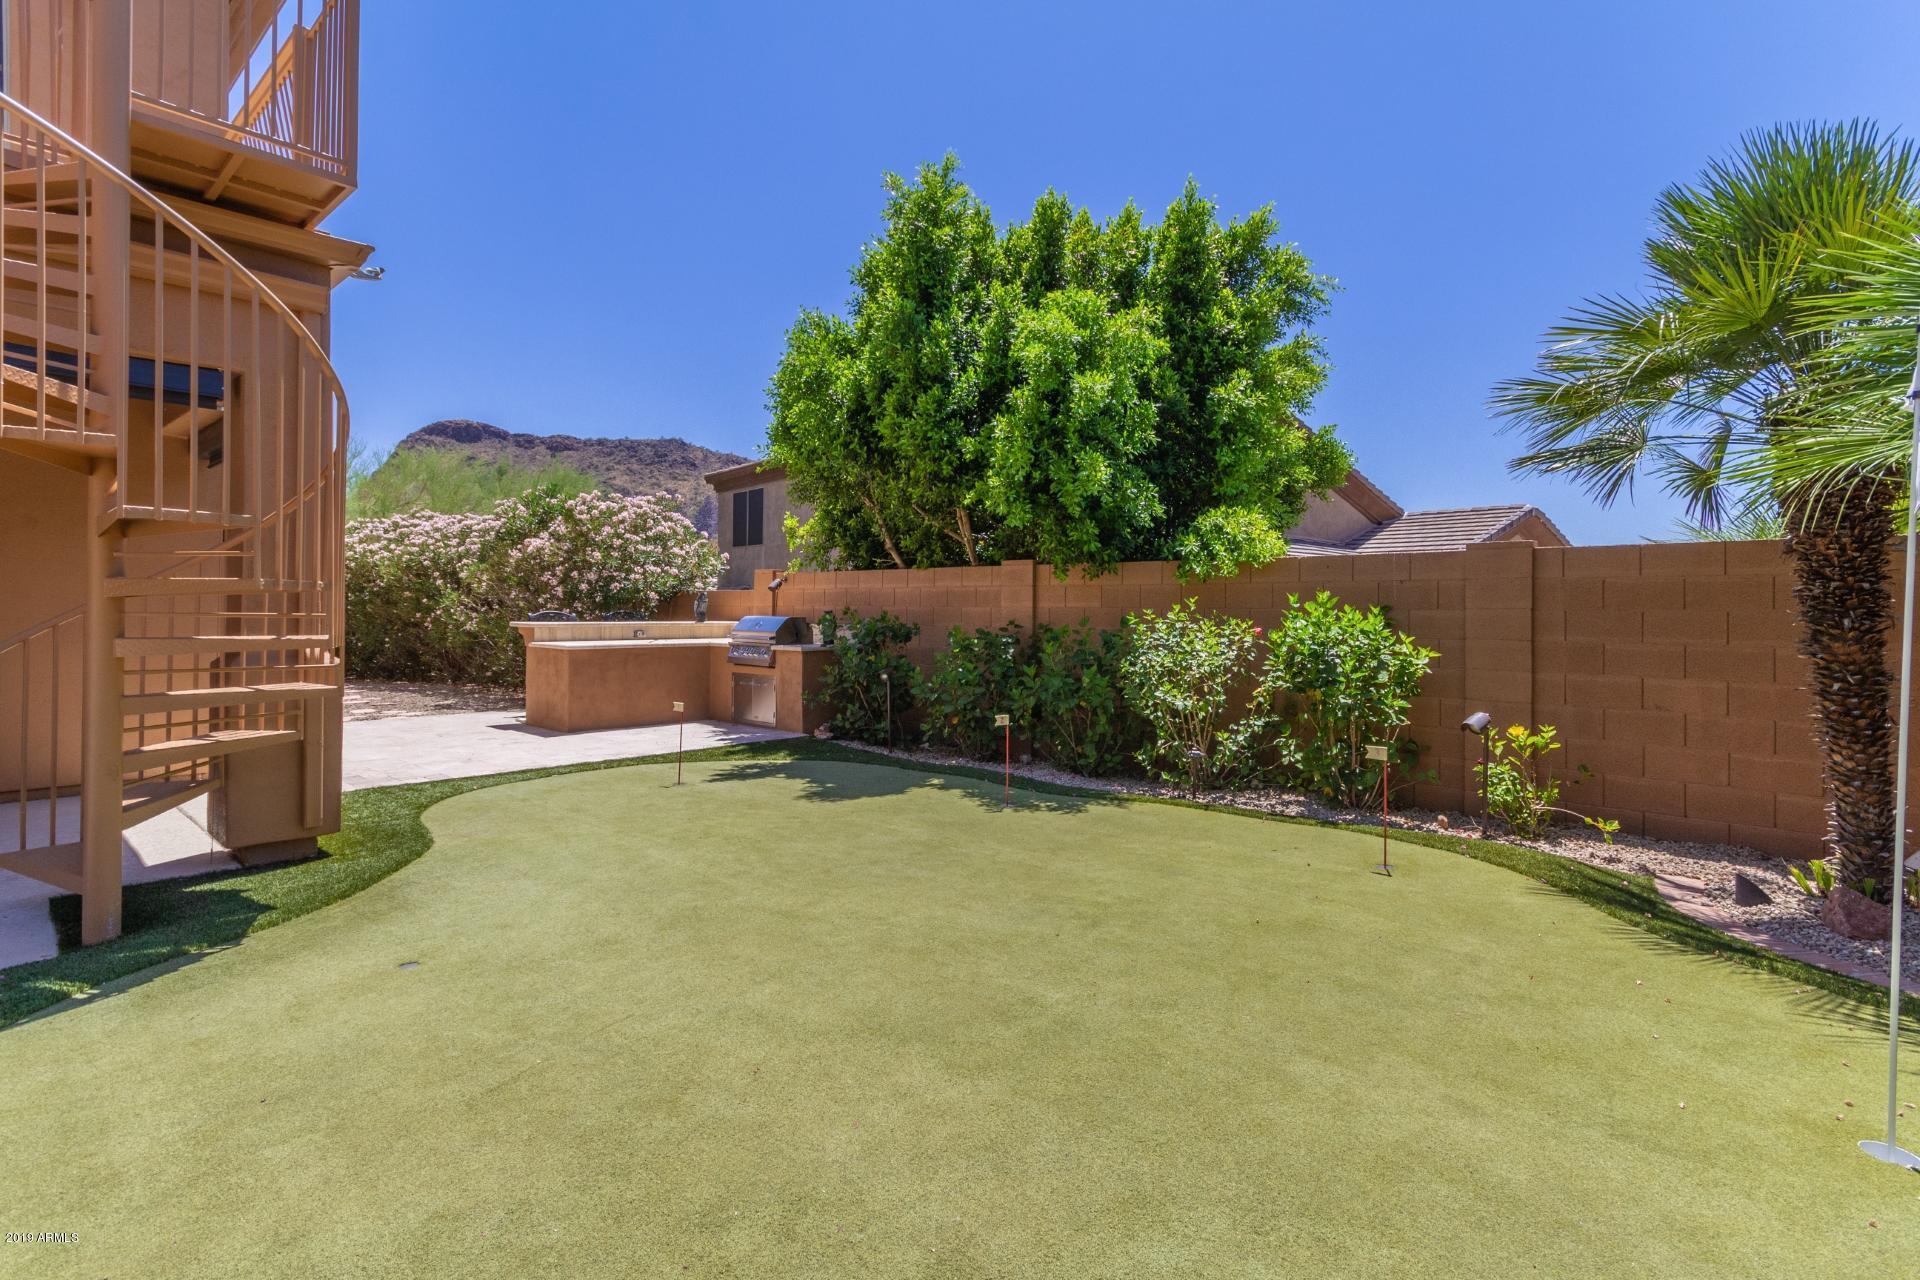 MLS 5941853 14048 E CLINTON Street, Scottsdale, AZ 85259 Scottsdale AZ Private Pool